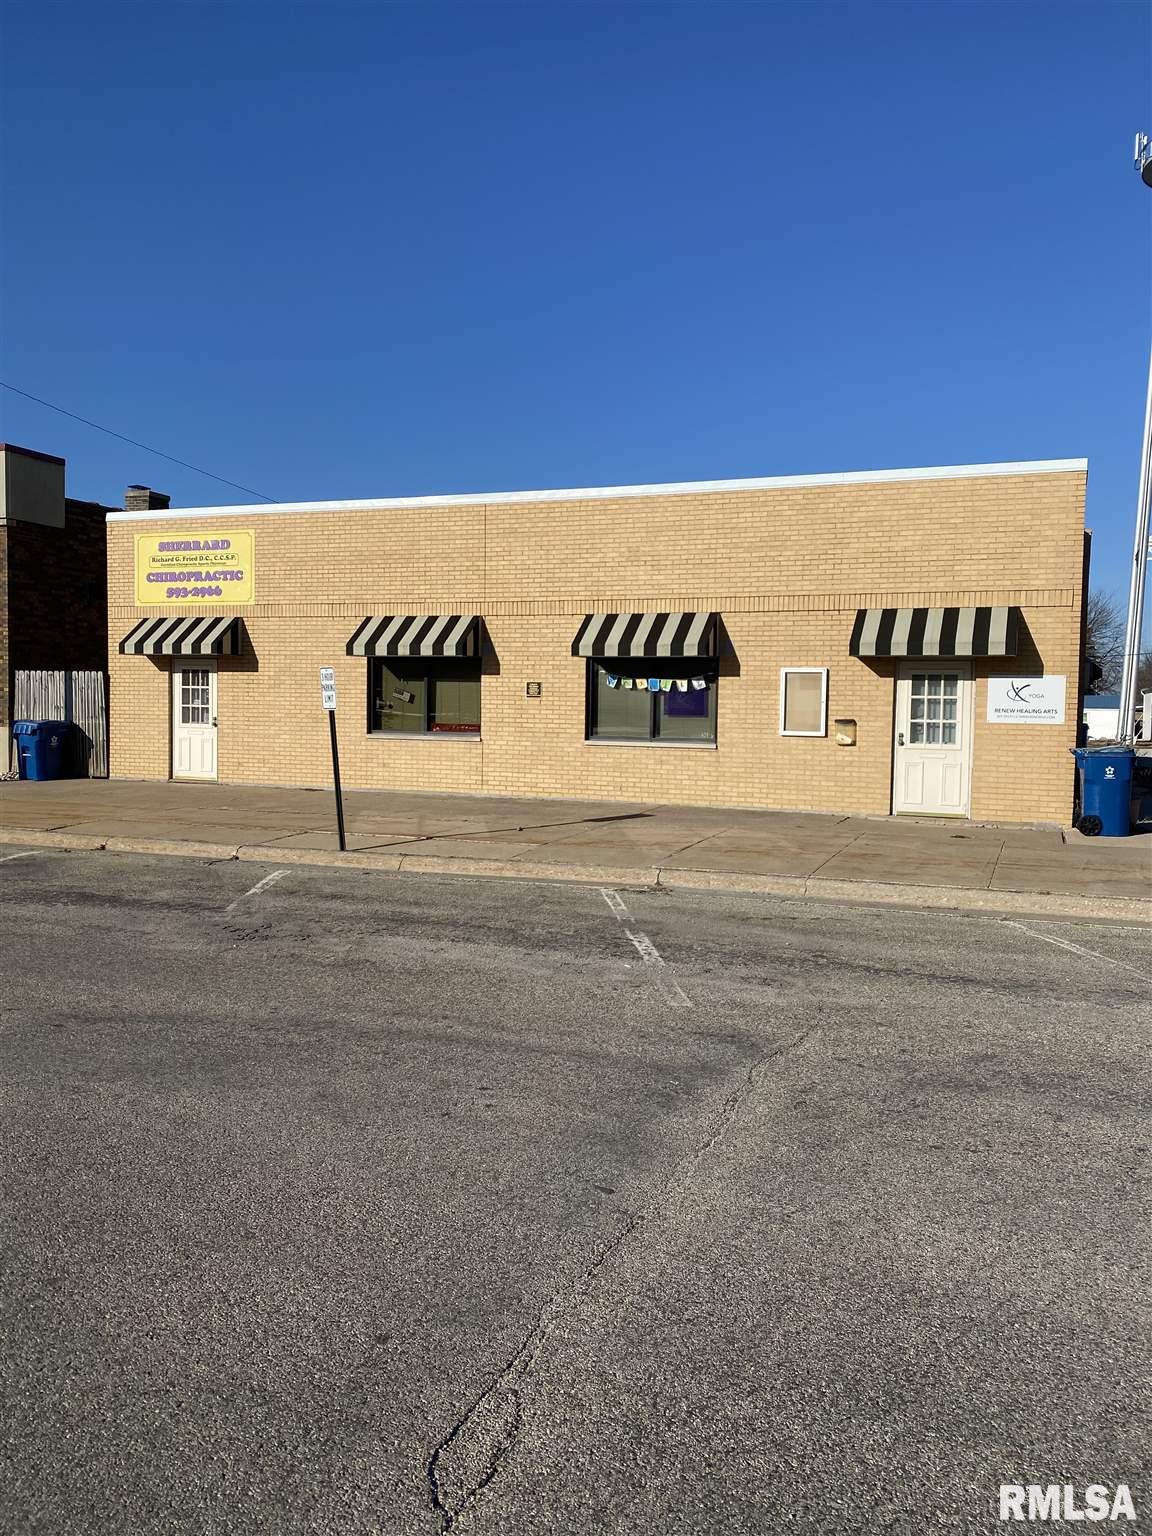 405 3RD Property Photo - Sherrard, IL real estate listing